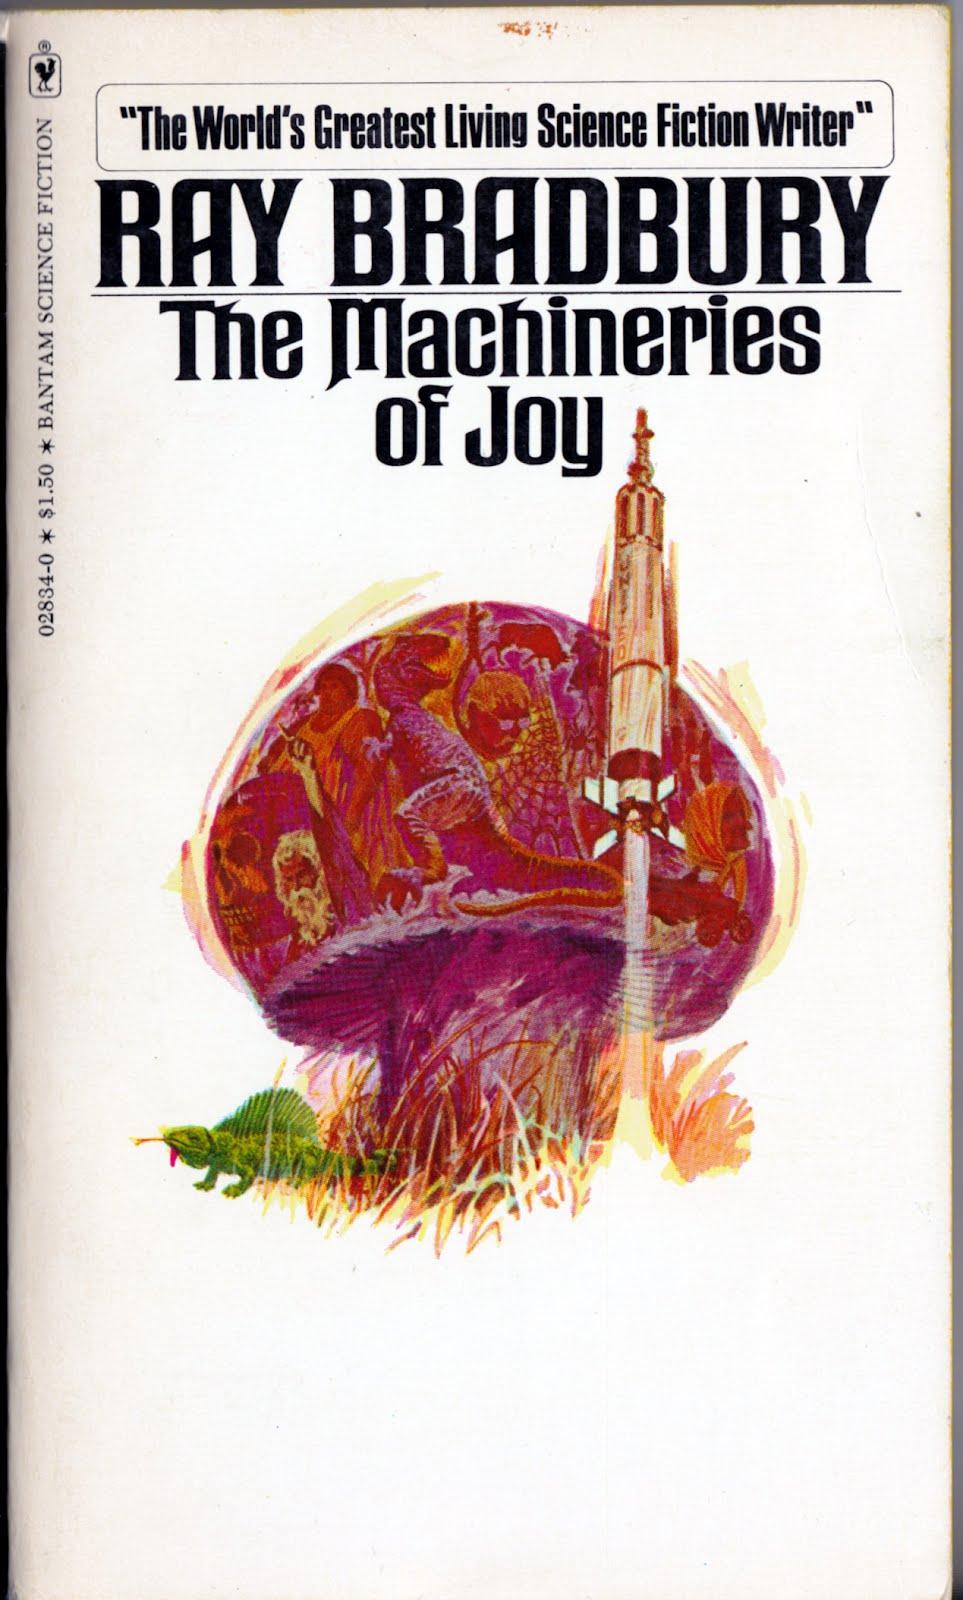 an analysis of the short stories of ray bradbury Ray bradbury fahrenheit 451 (see the list of his novels and short story wwwnotablebiographiescom/be-br/bradbury-rayhtml.